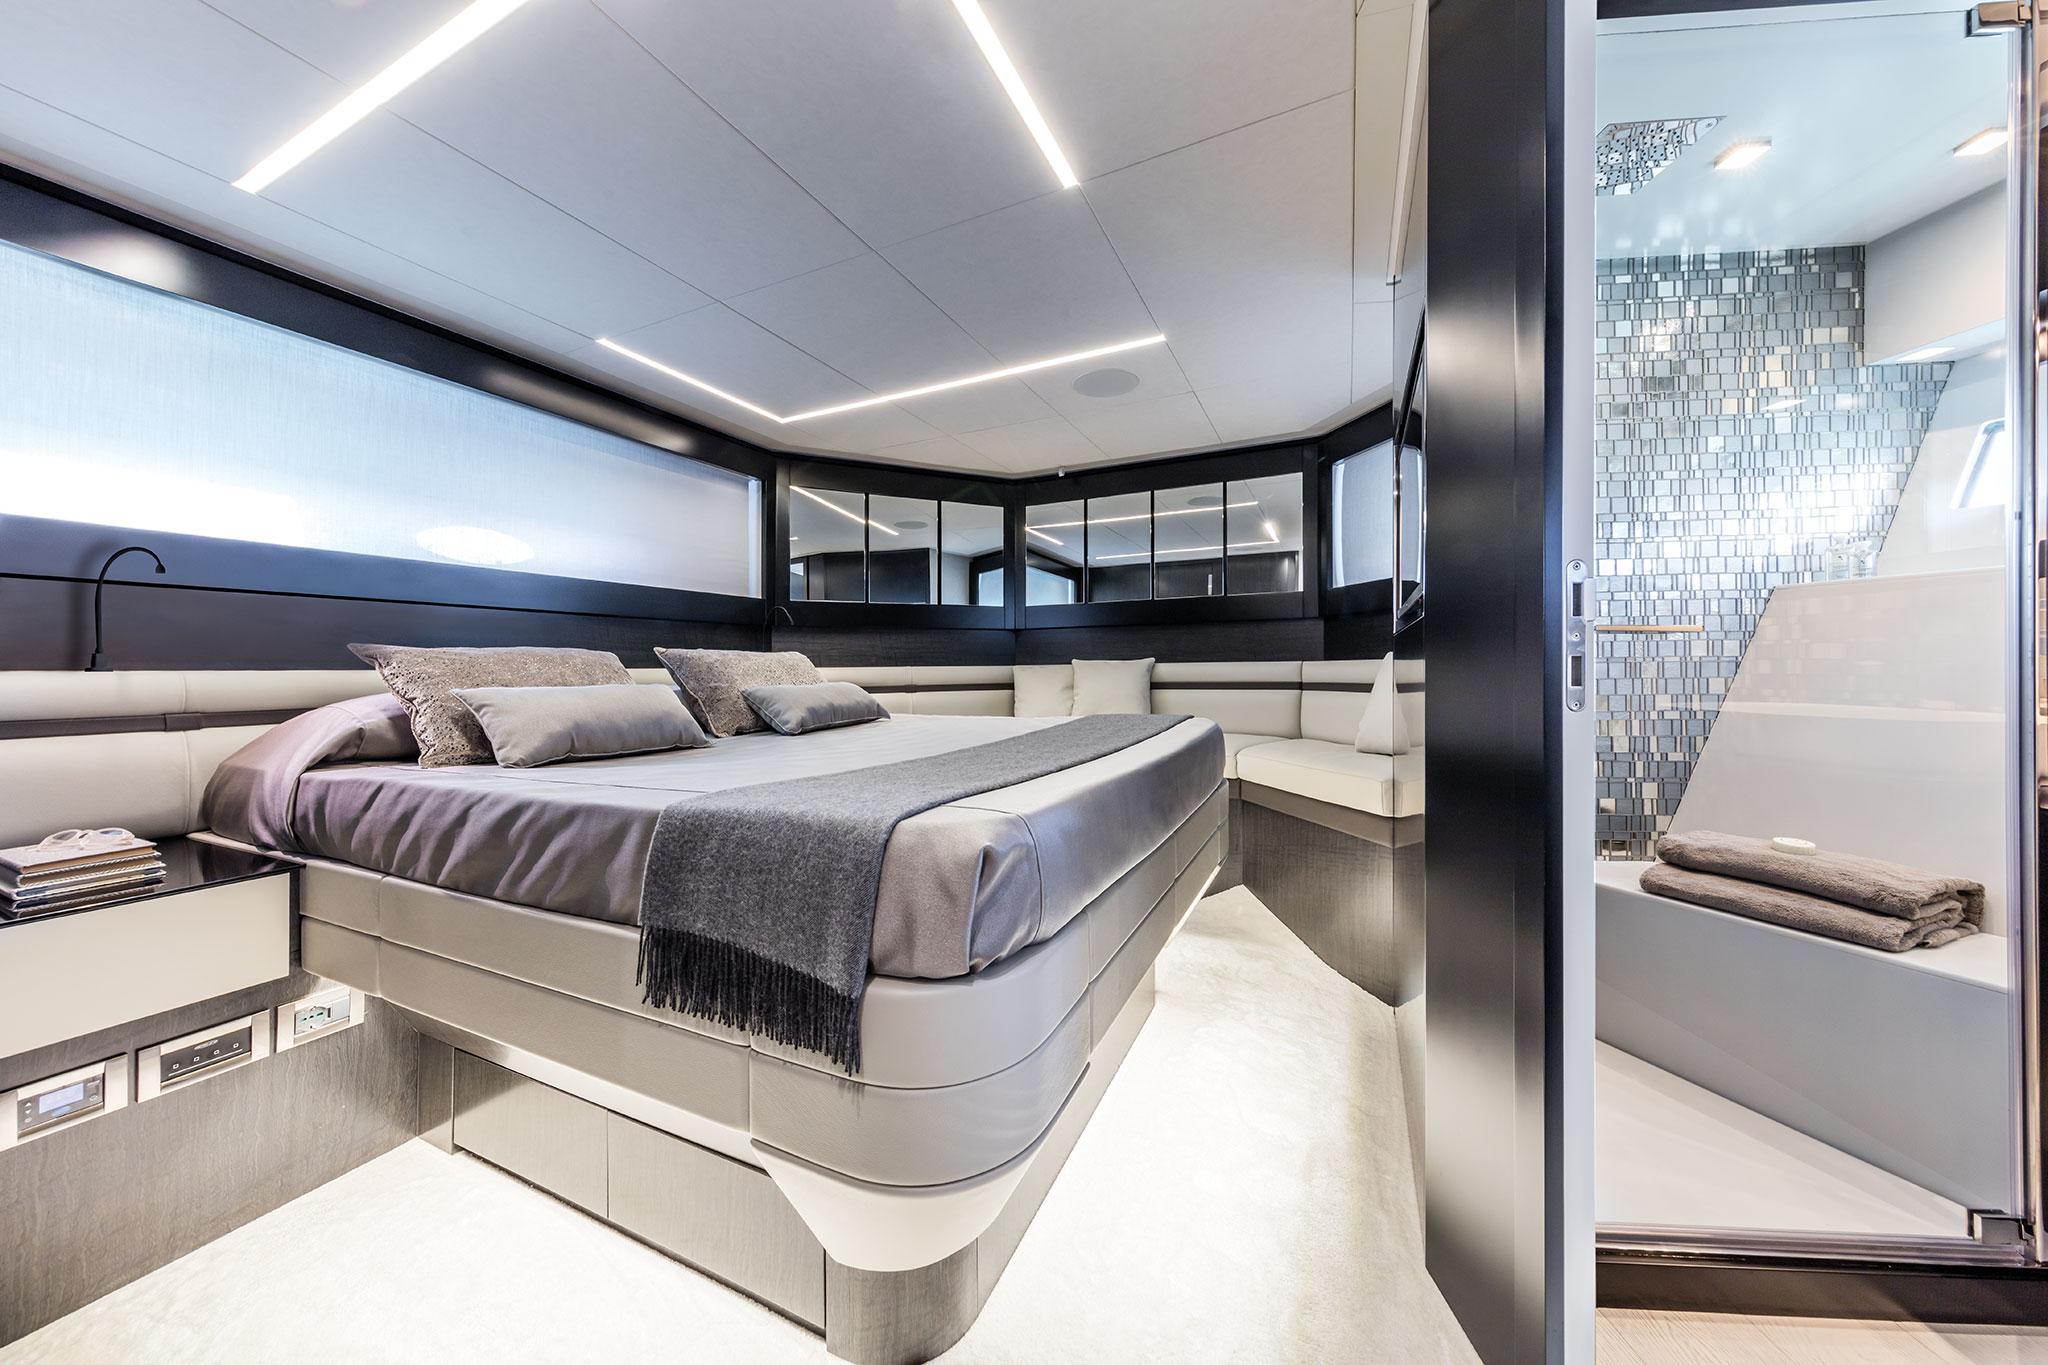 ferretti-group-pershing-9x-yachts-france-171-10